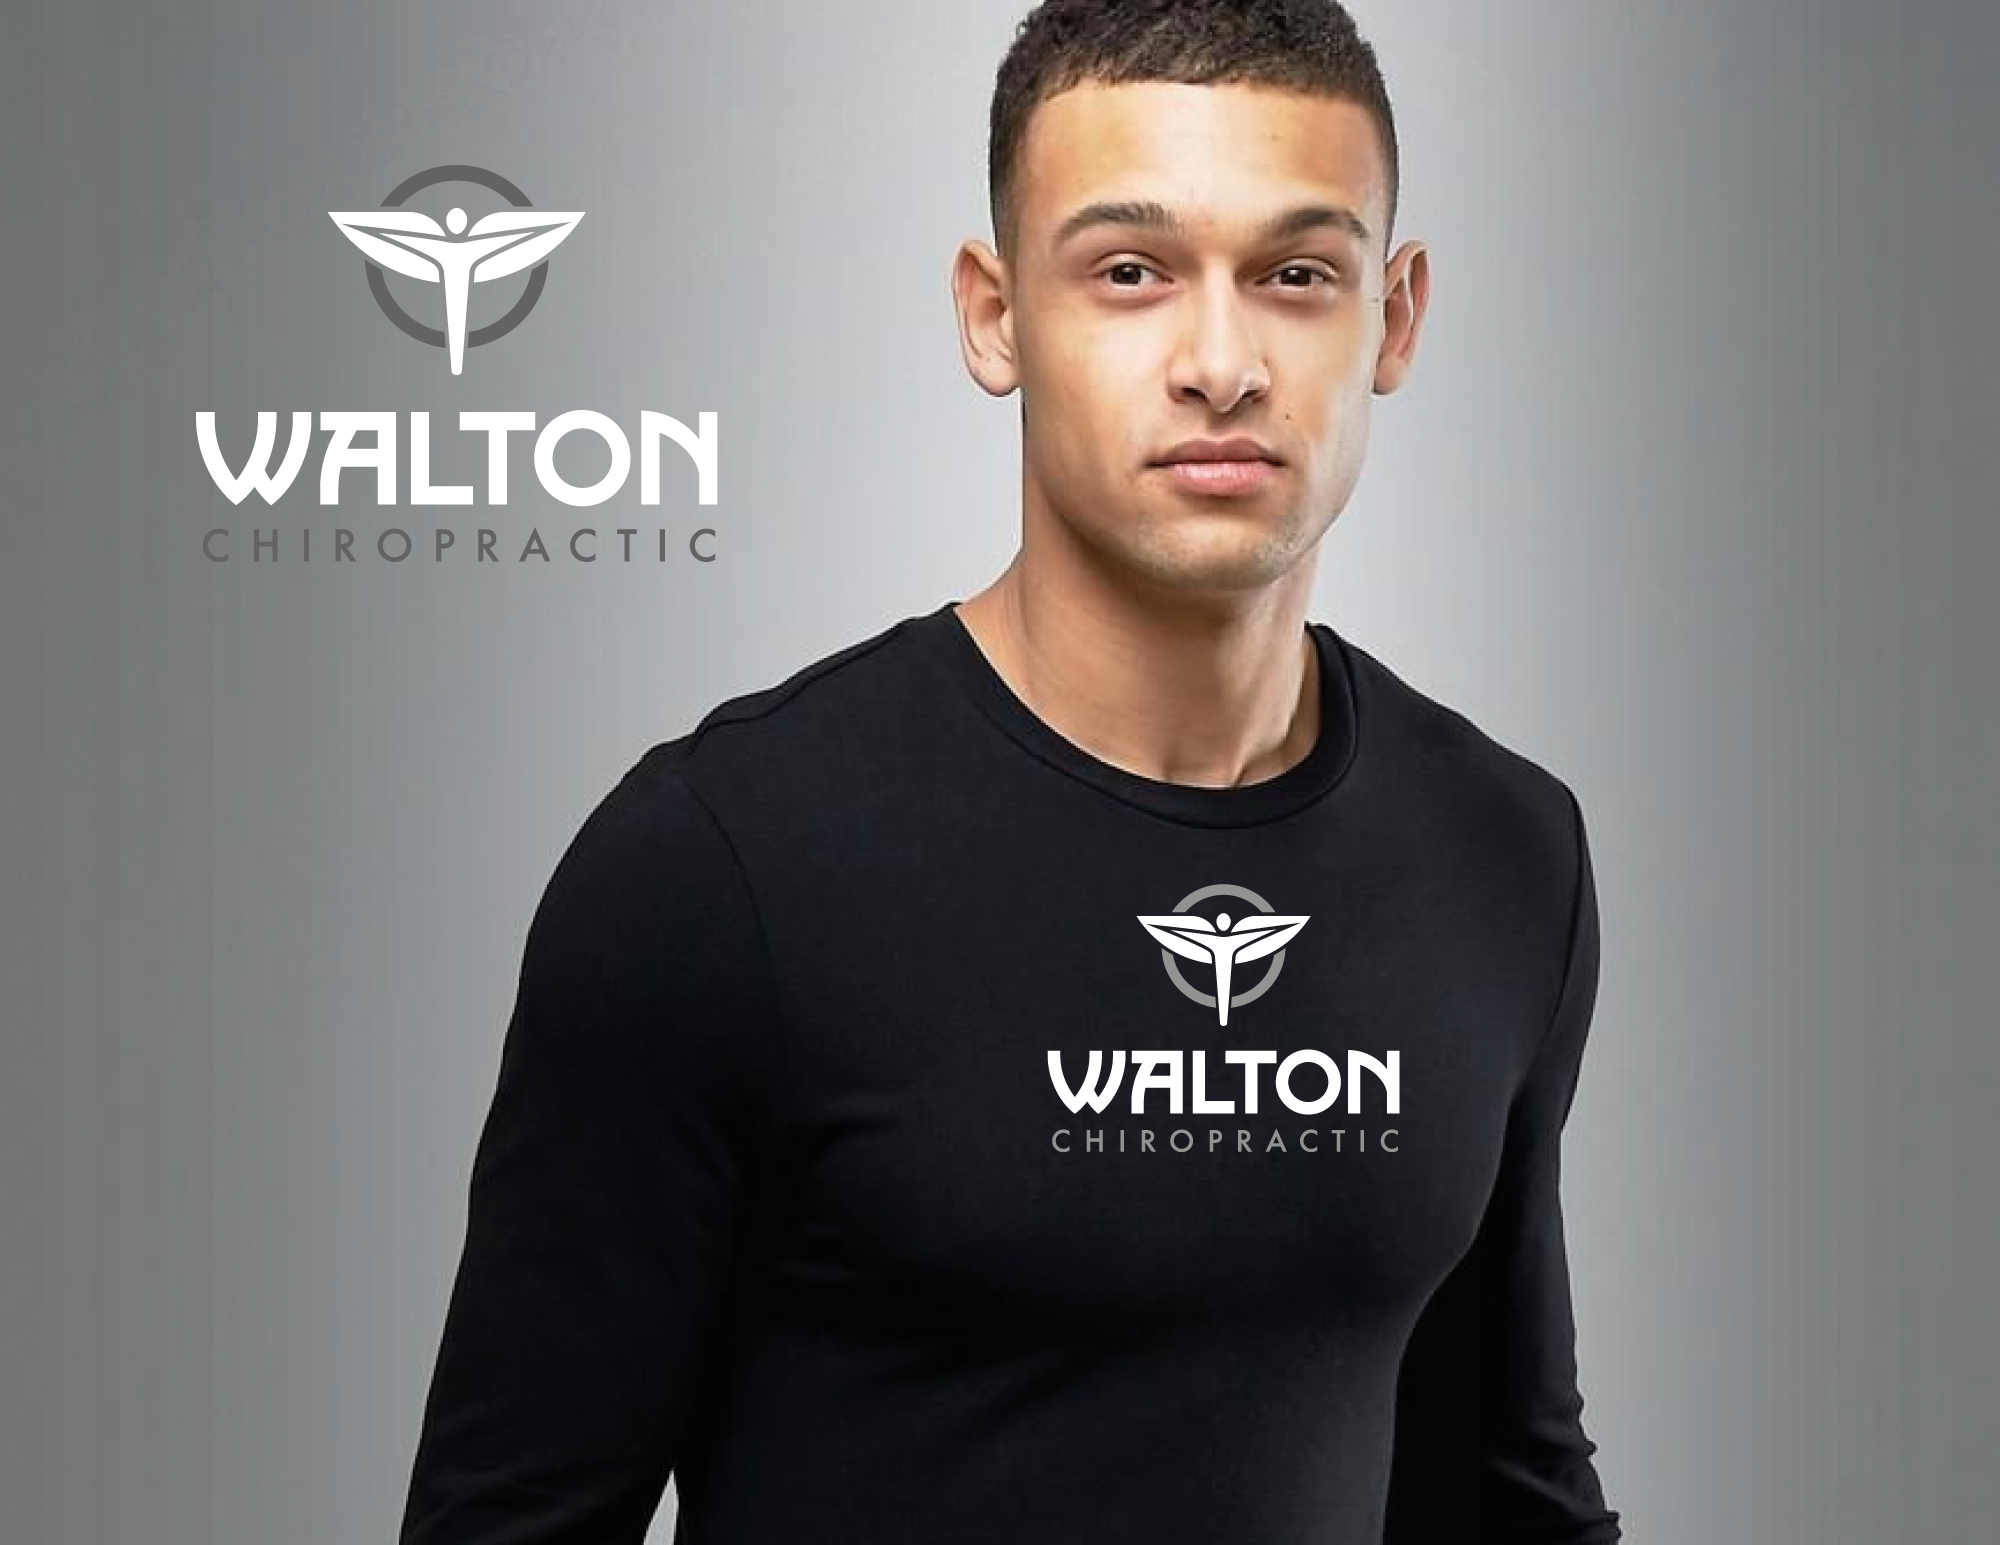 Walton Chiropractic T-shirt Concept